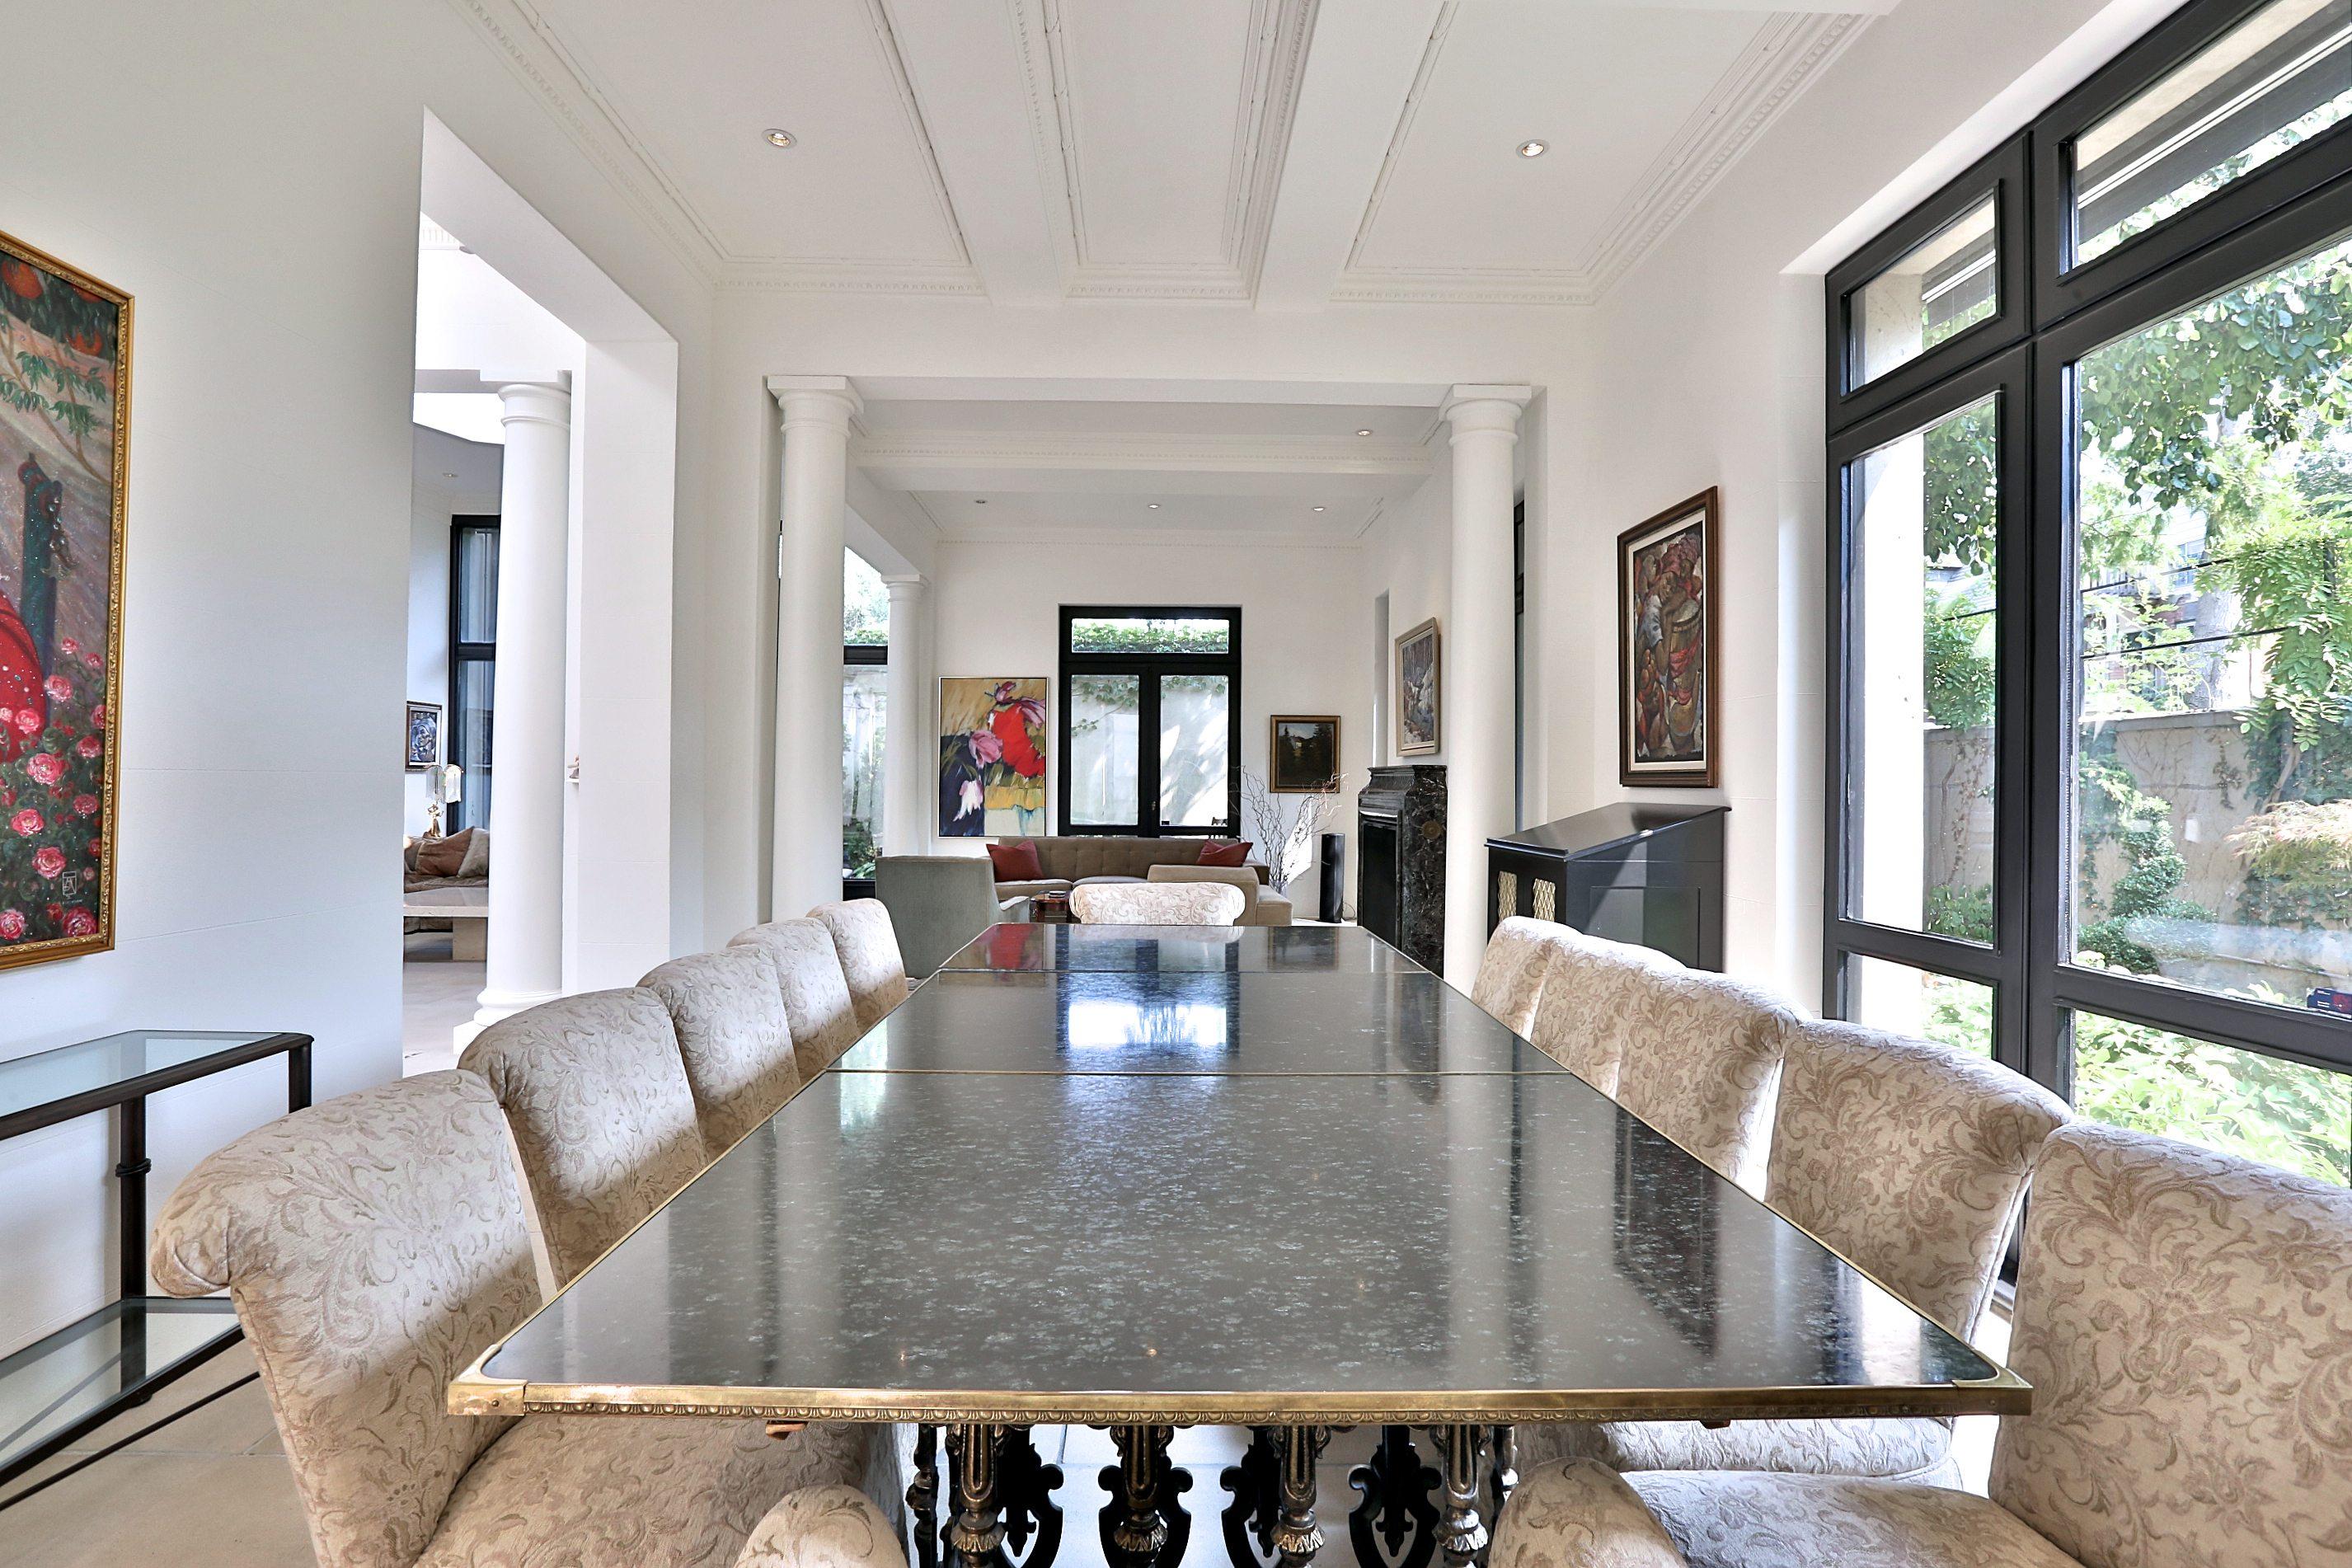 toronto-house-for-sale-7-sherwood-lane-6